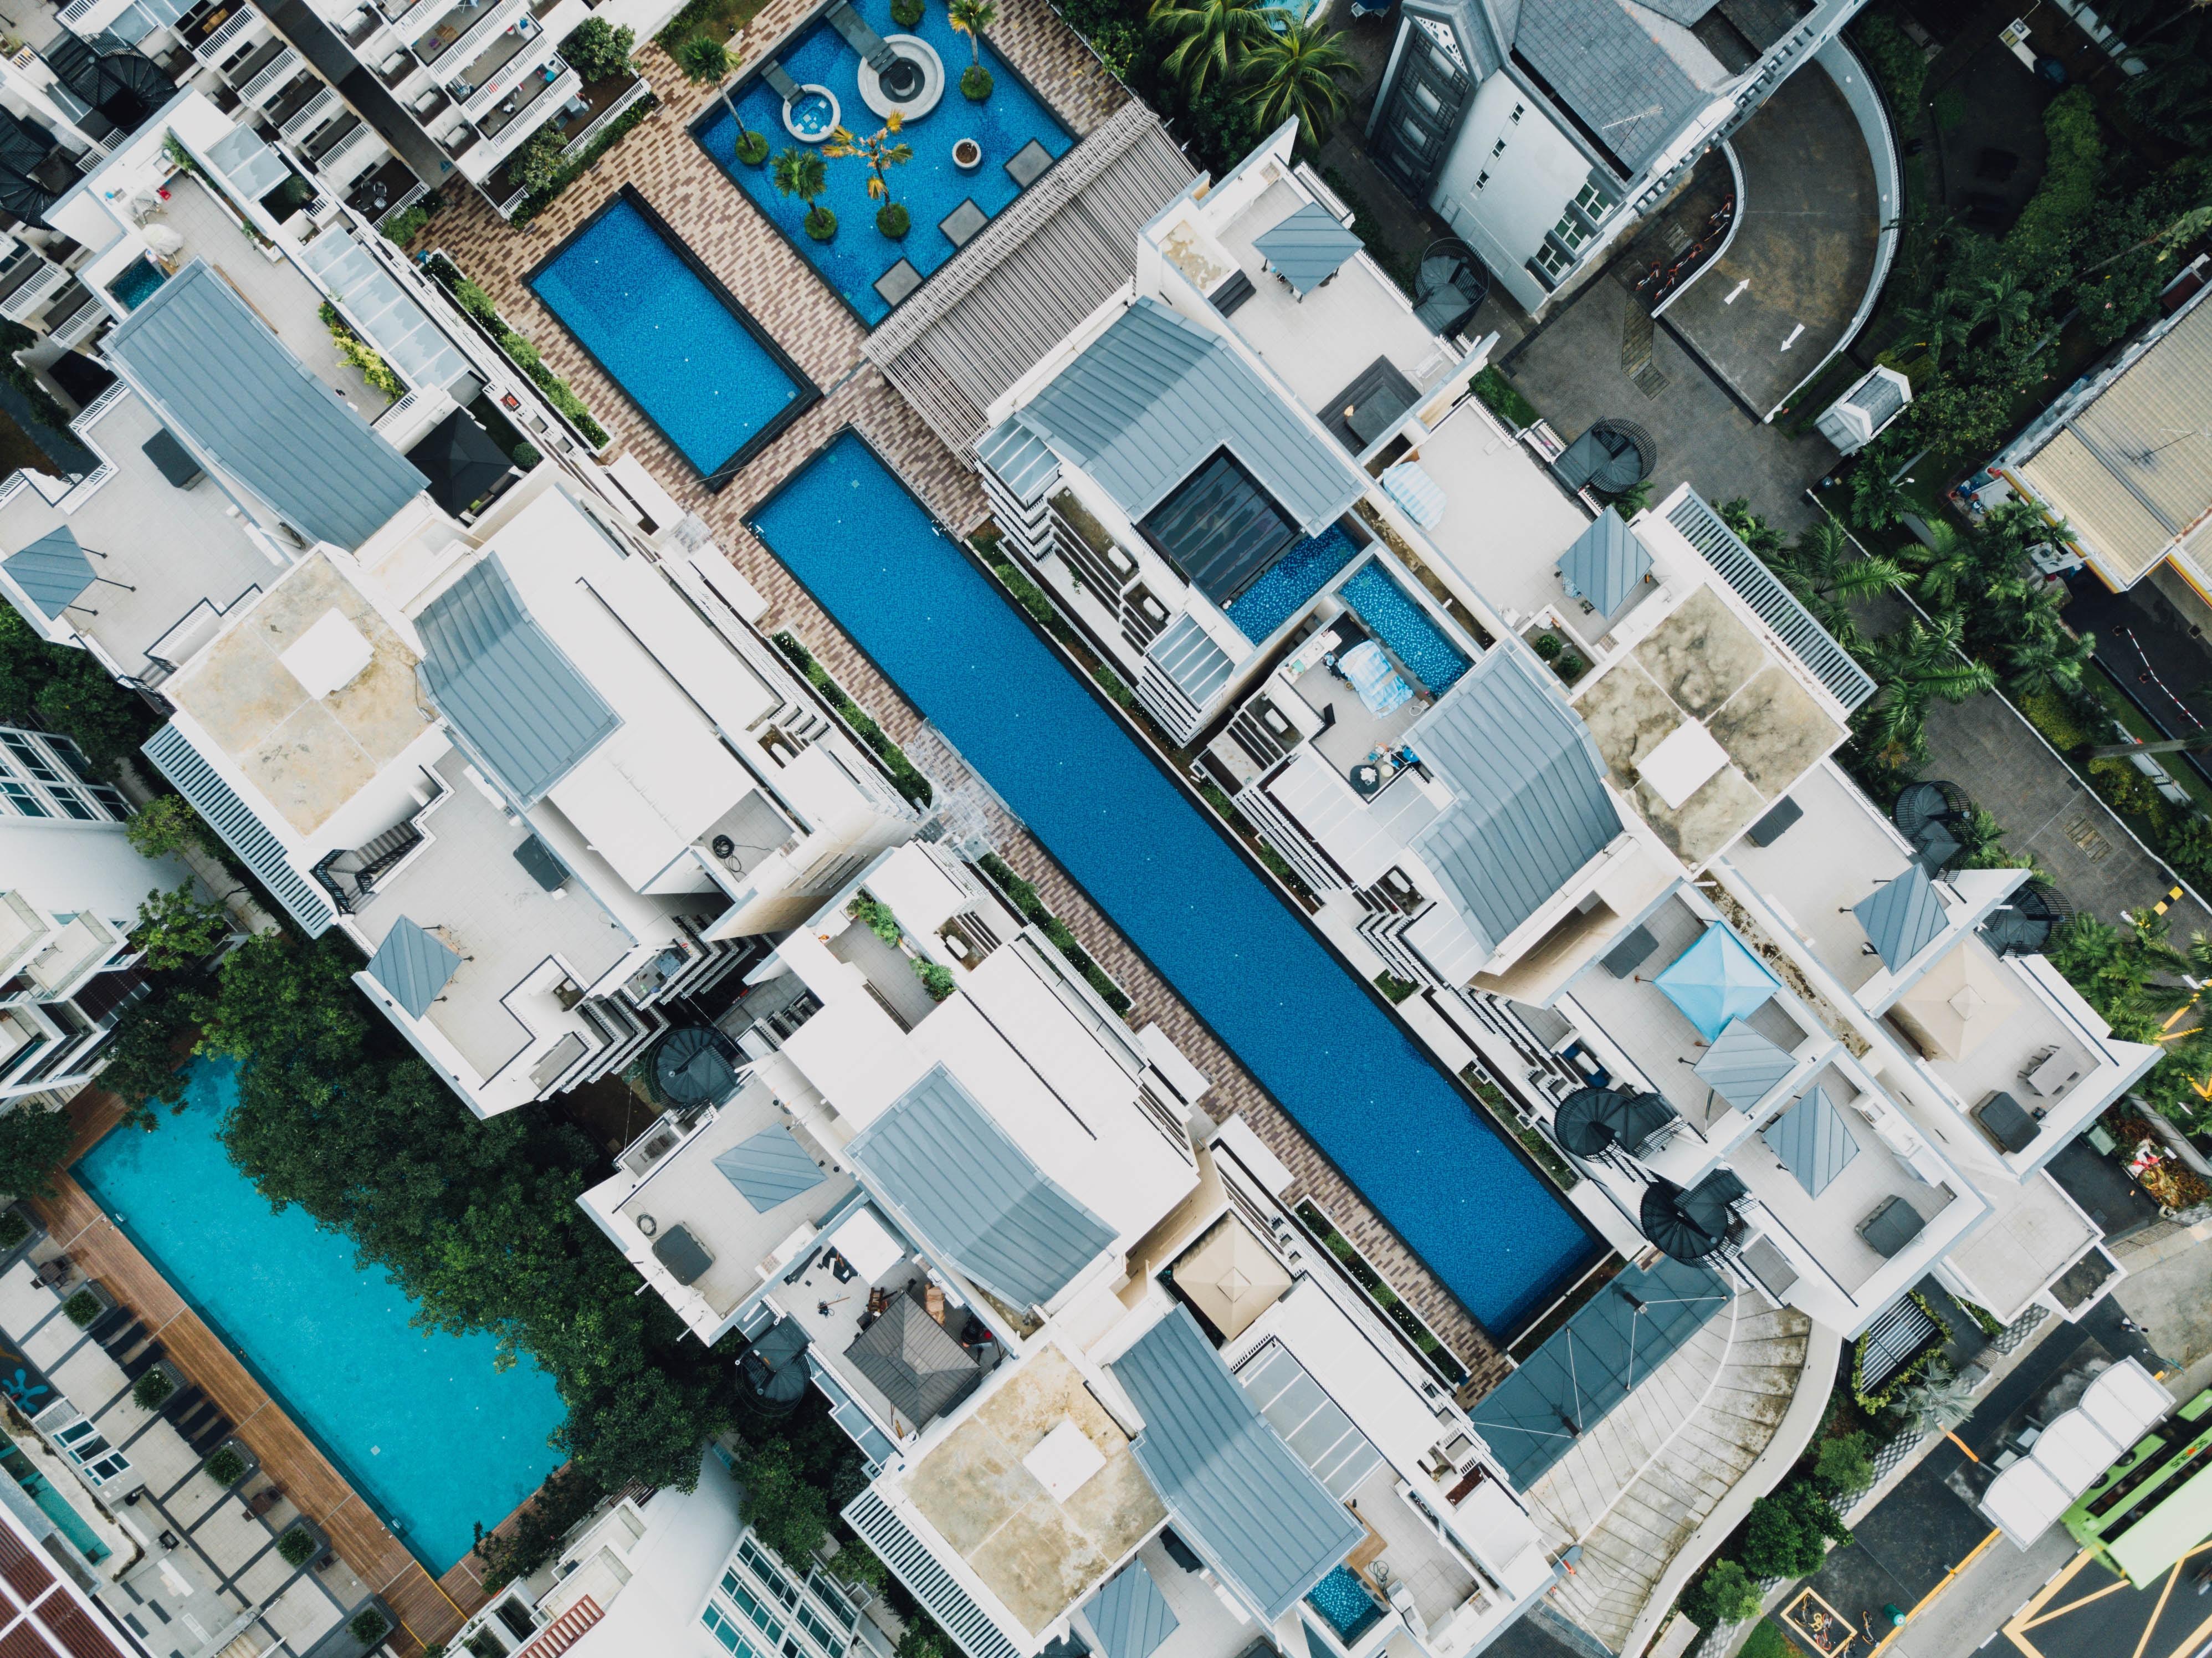 aerial shot of white houses